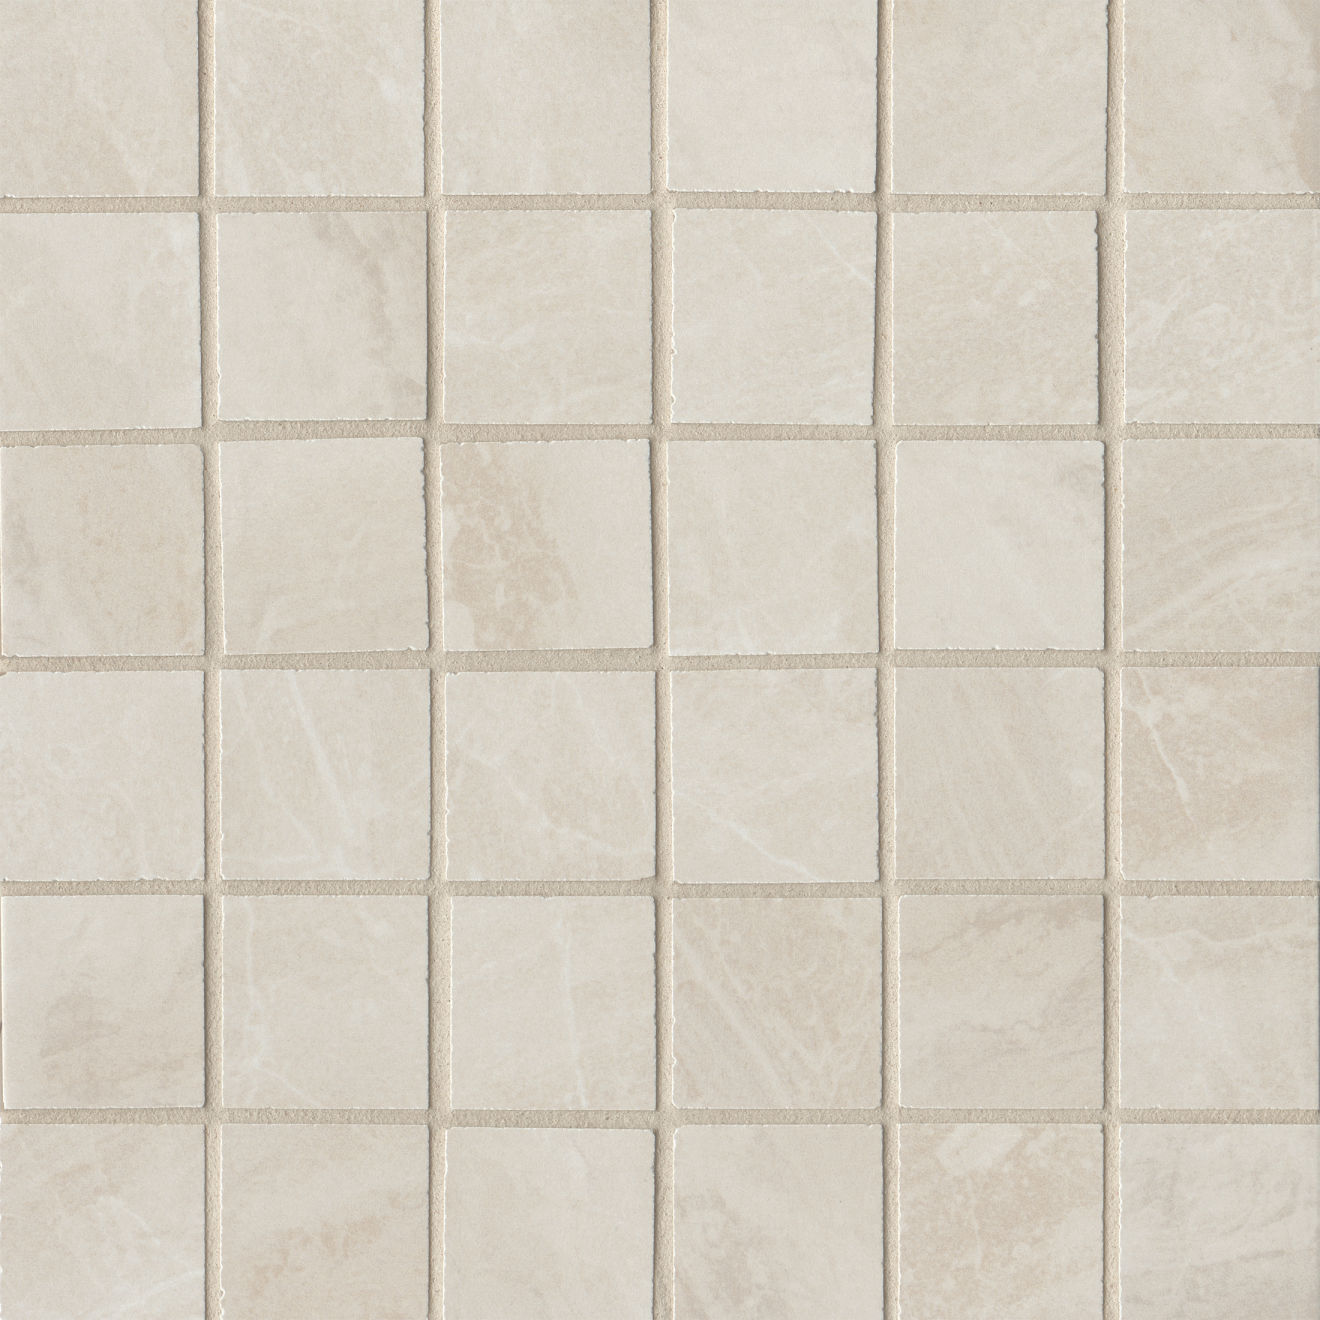 "Stone Mountain 2.0 2""x2"" Matte Porcelain Mosaic in White"